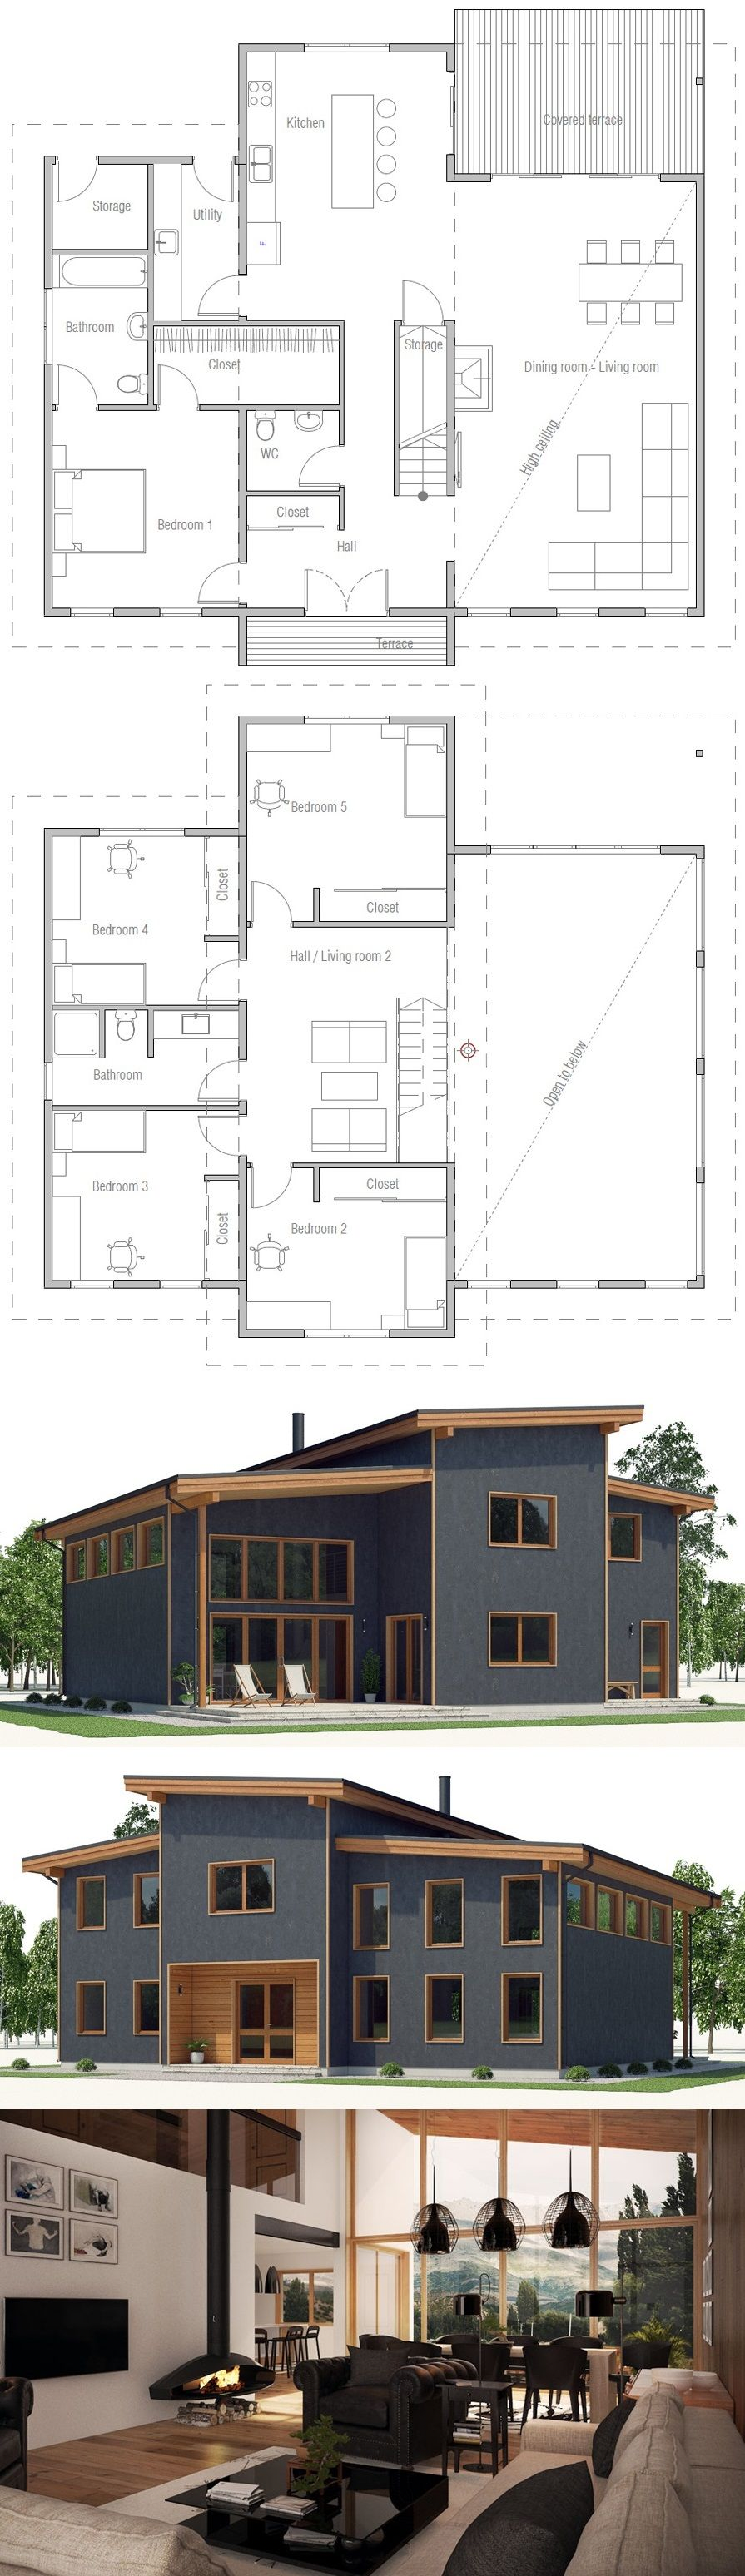 plan de maison high ranch